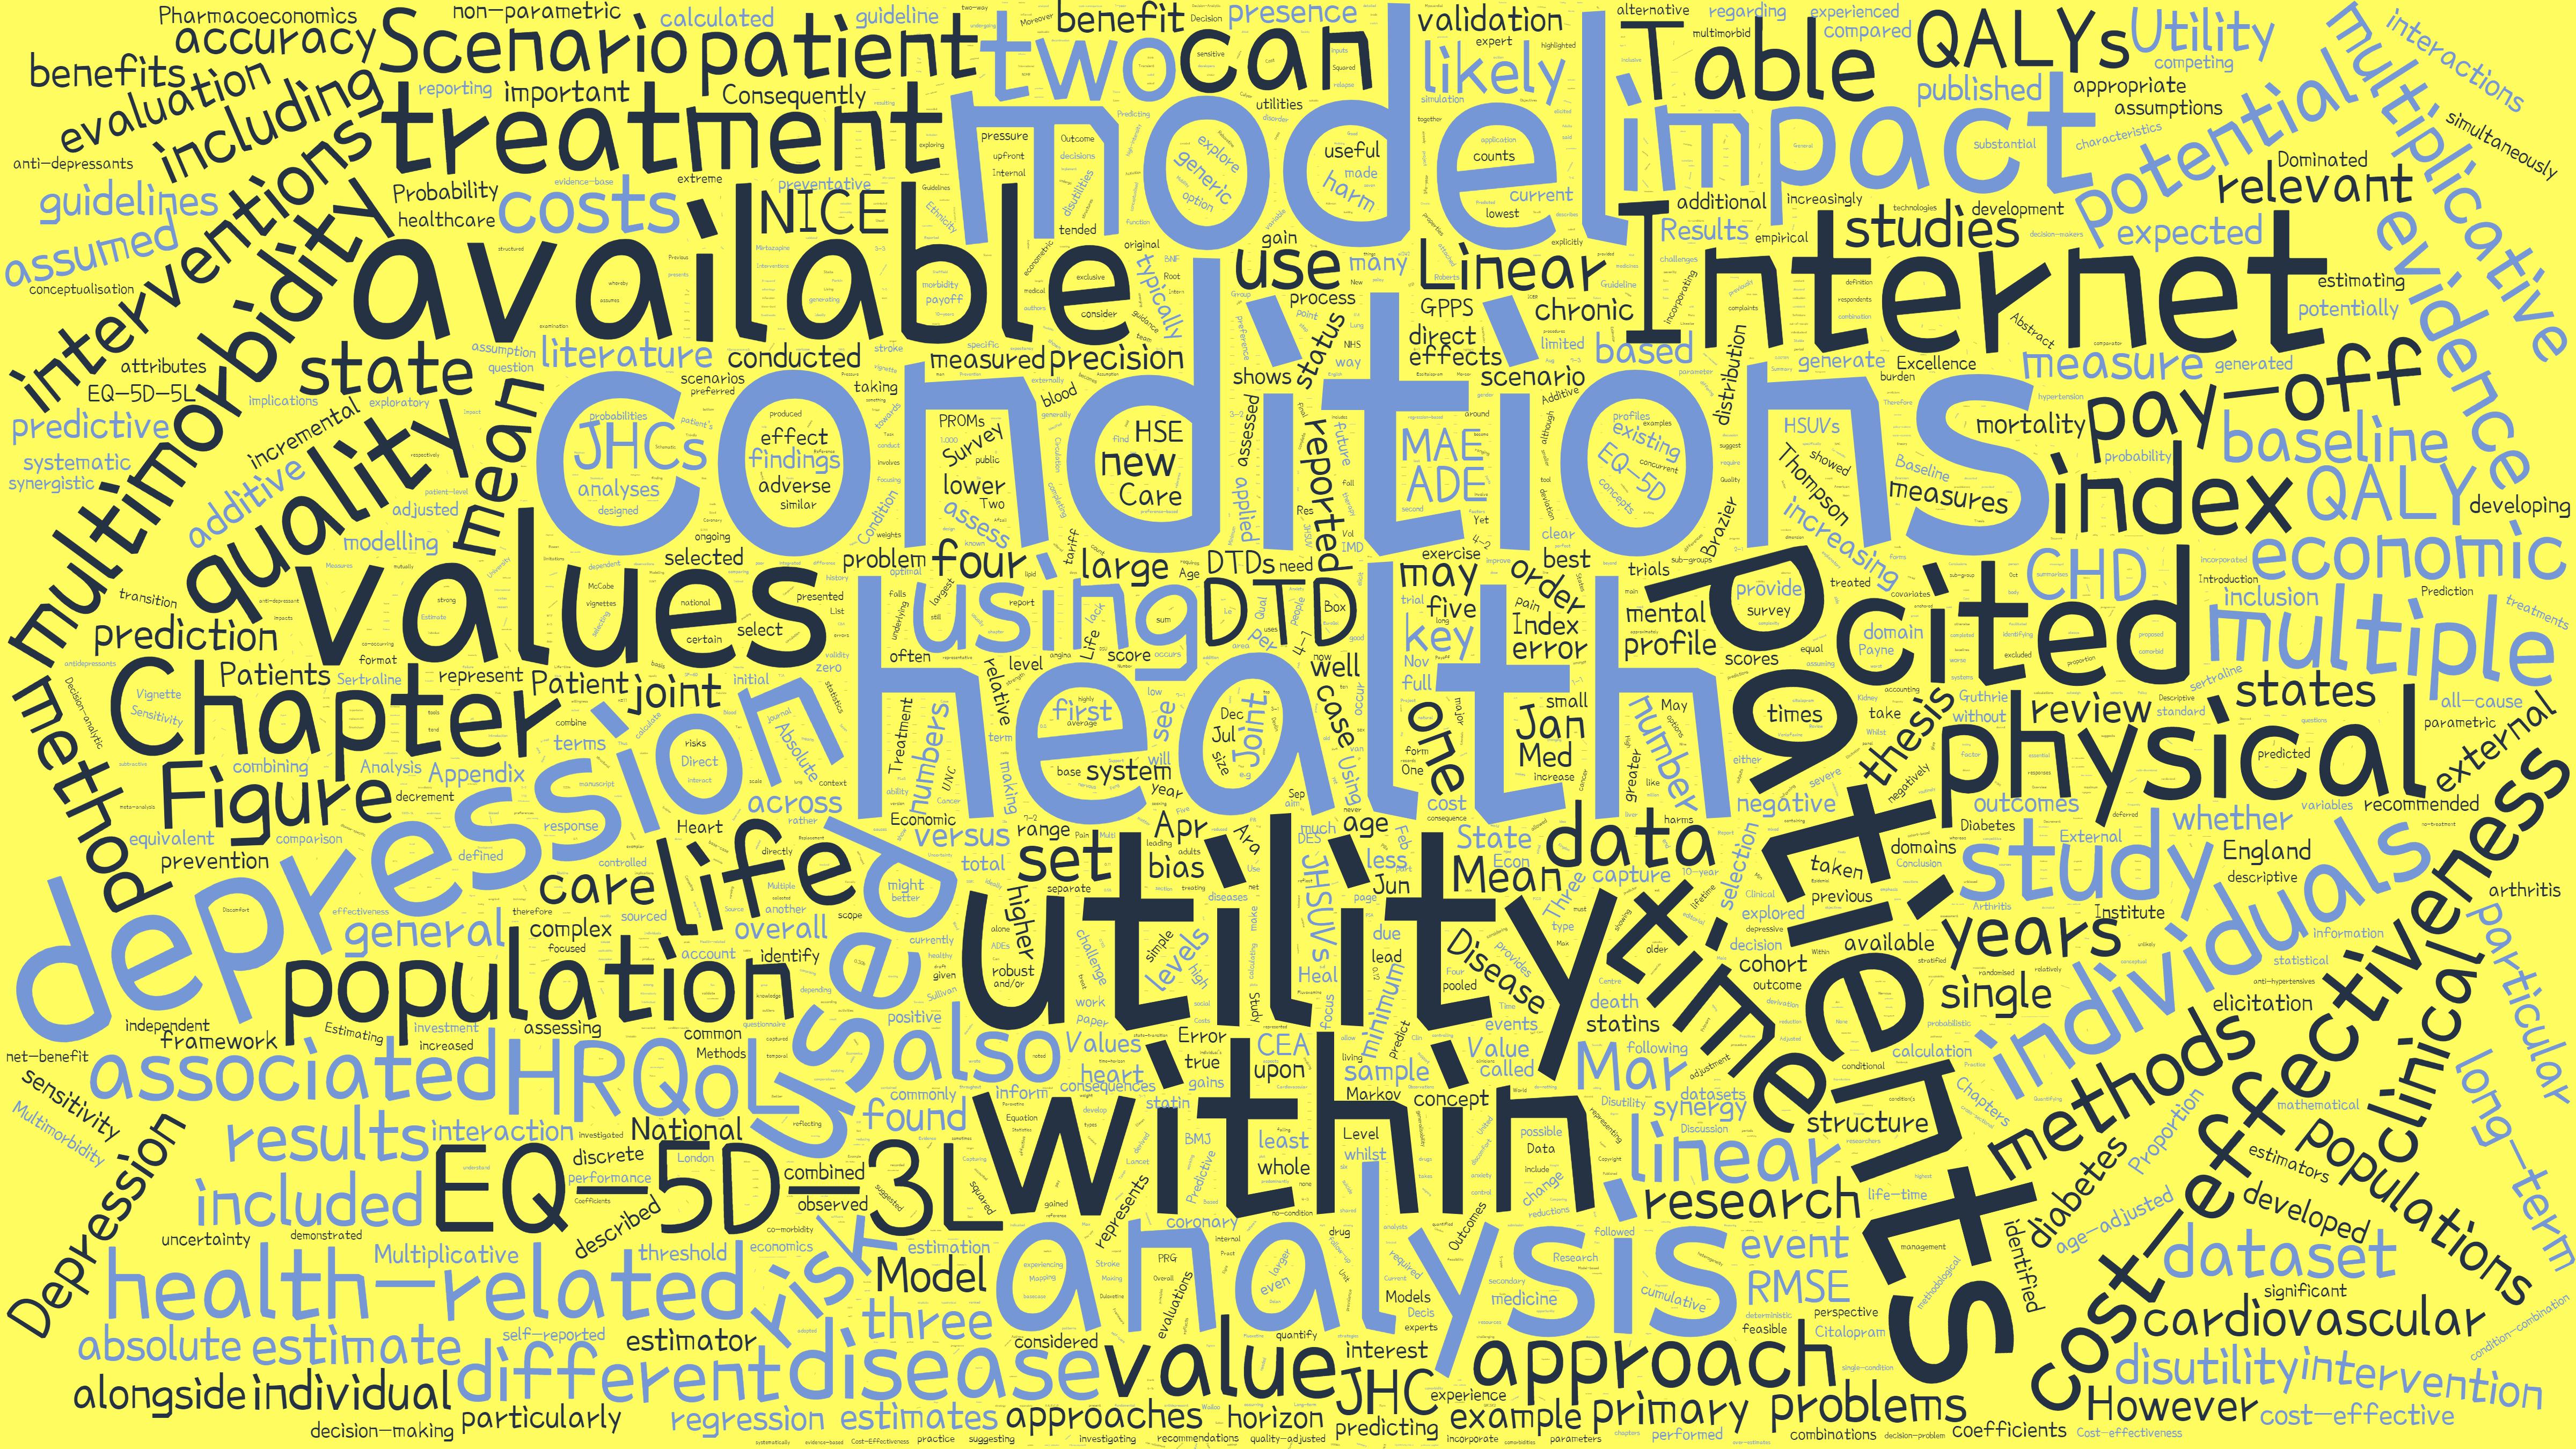 Thesis Thursday: Alexander Thompson - The Academic Health Economists' Blog